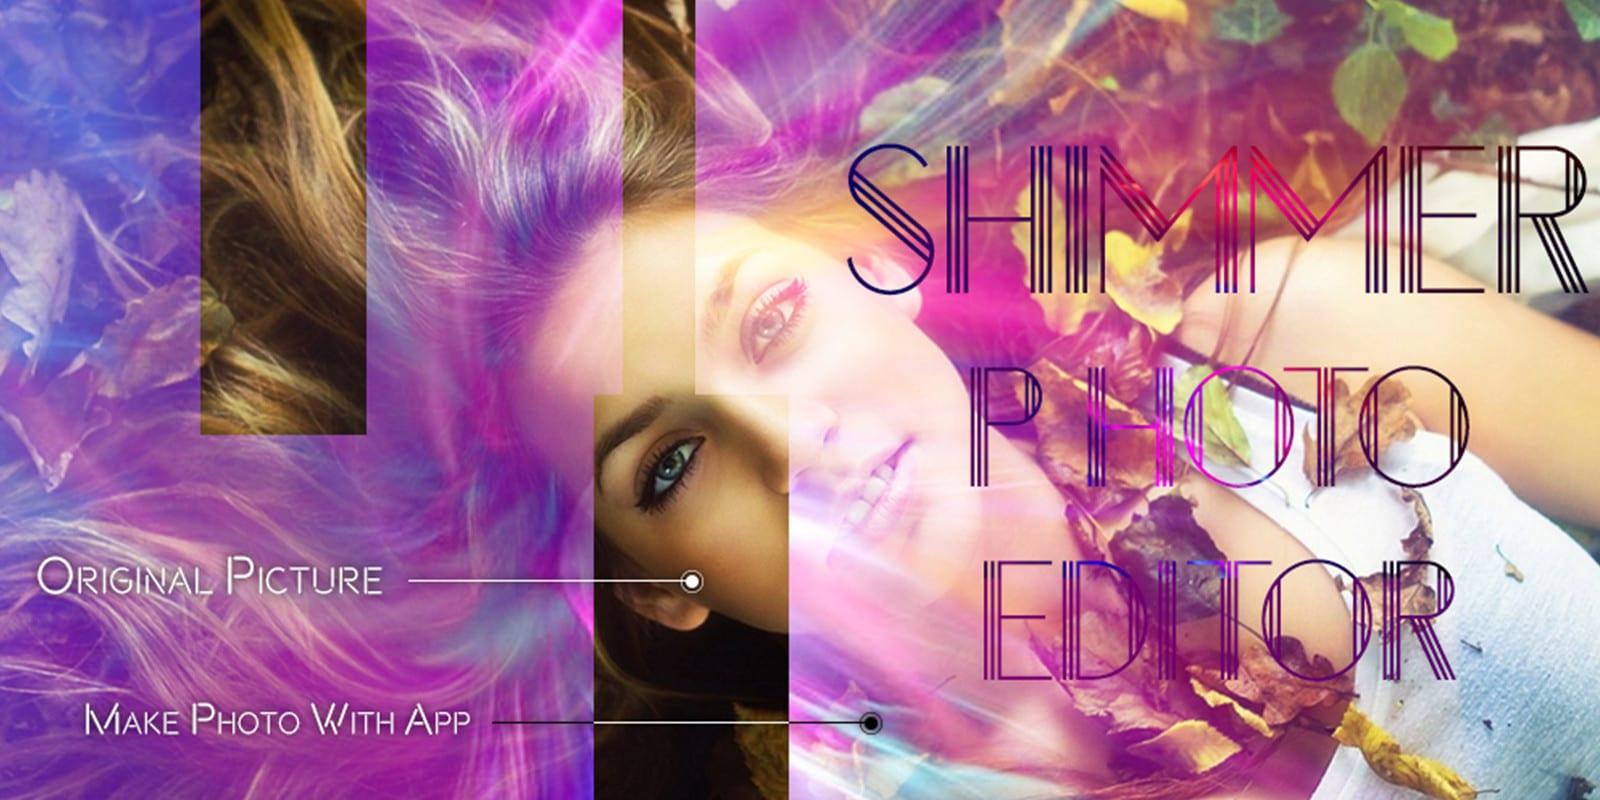 Sell Photo Editor App Or Android Application Source Code By Mitumoradiya